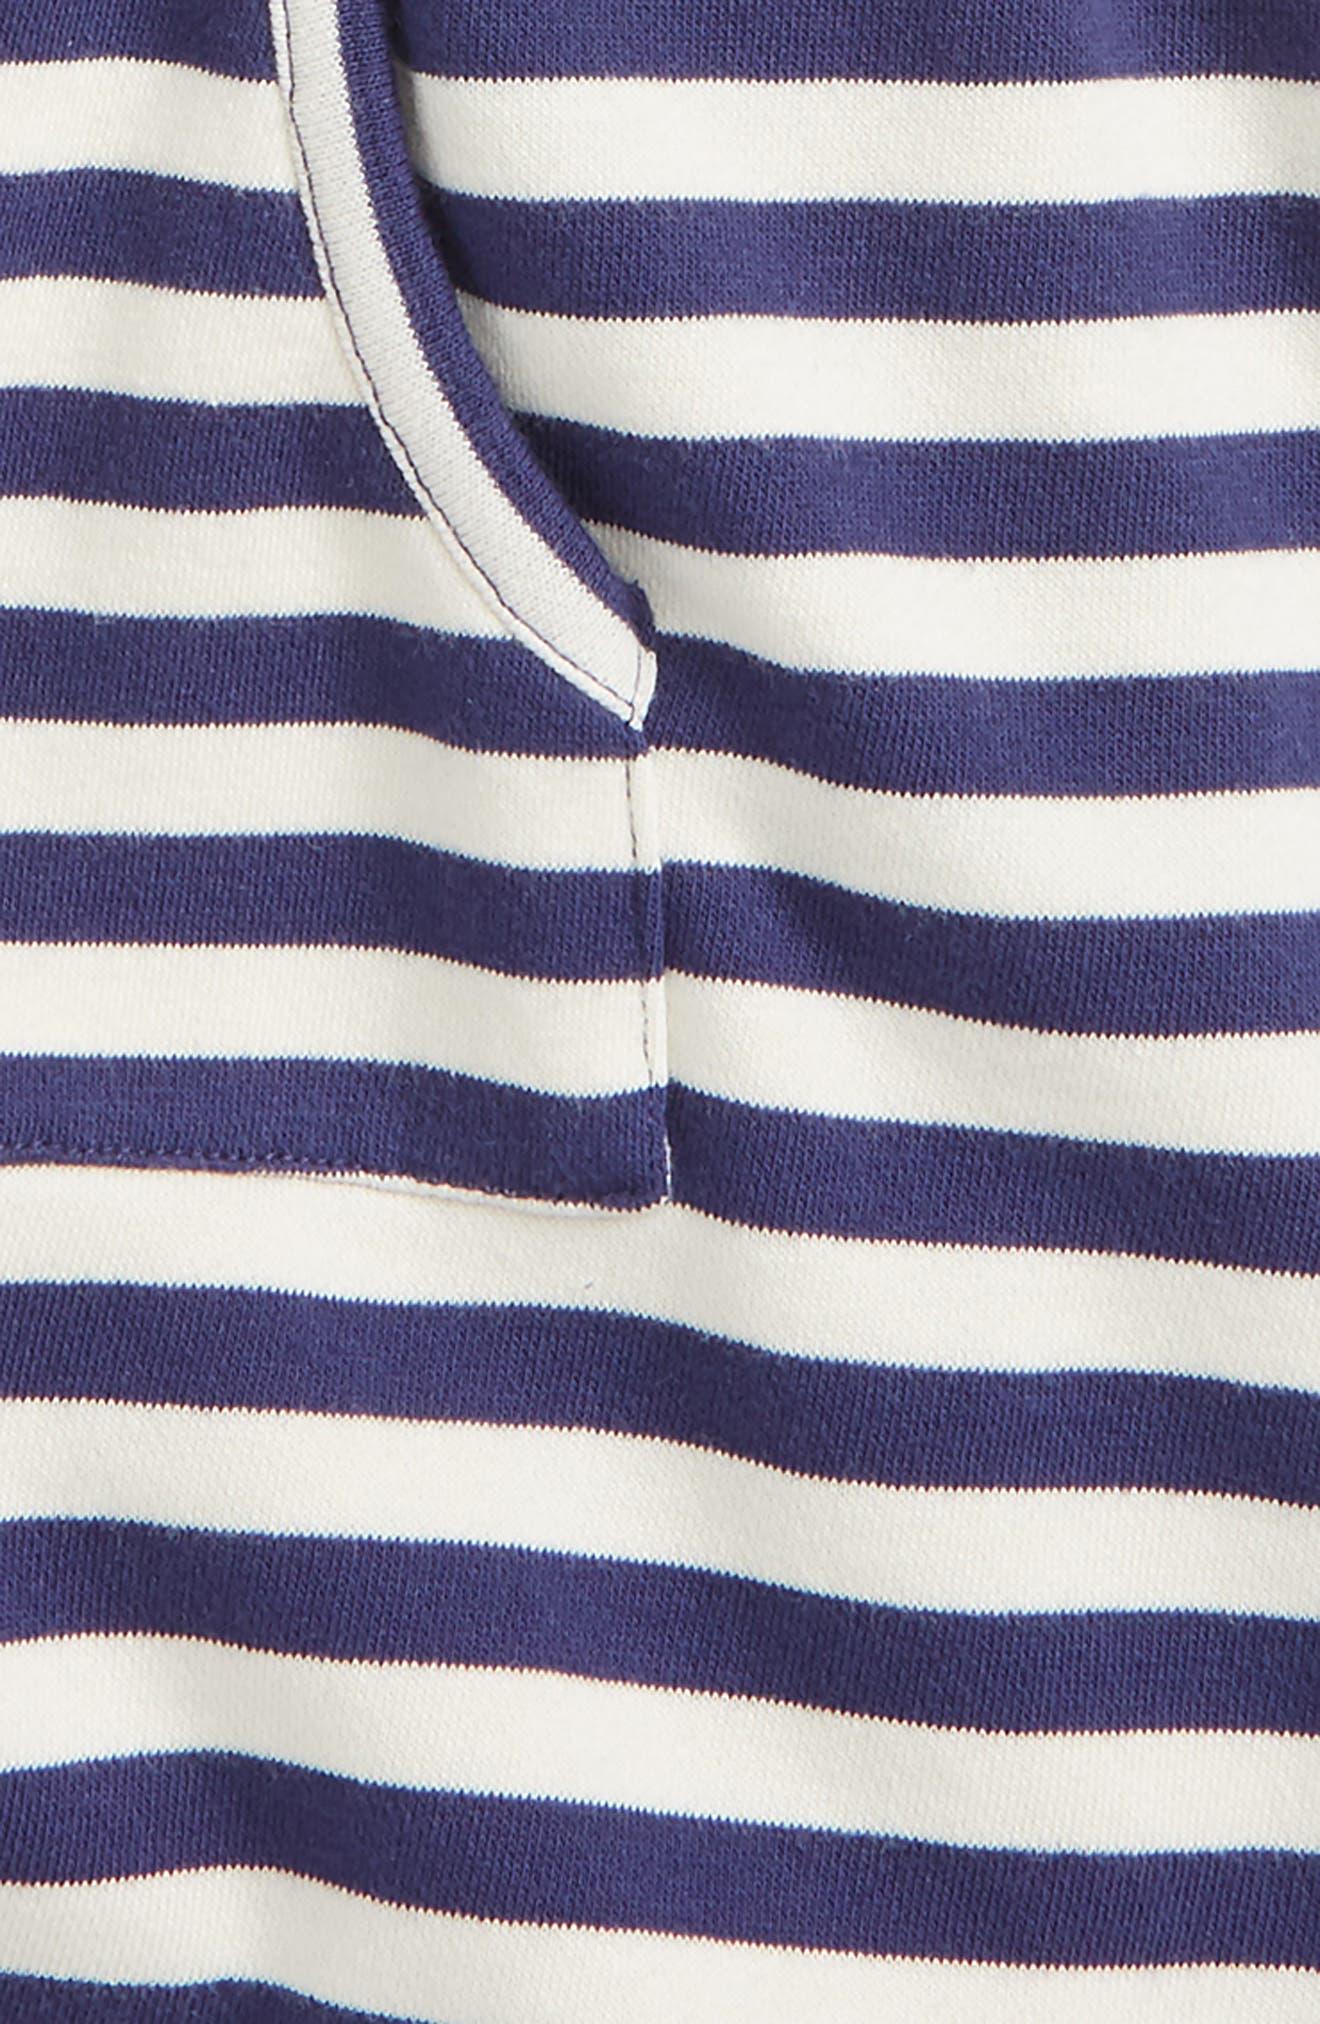 Stripe Skort,                             Alternate thumbnail 2, color,                             Navy Ribbon- Ivory Stripe